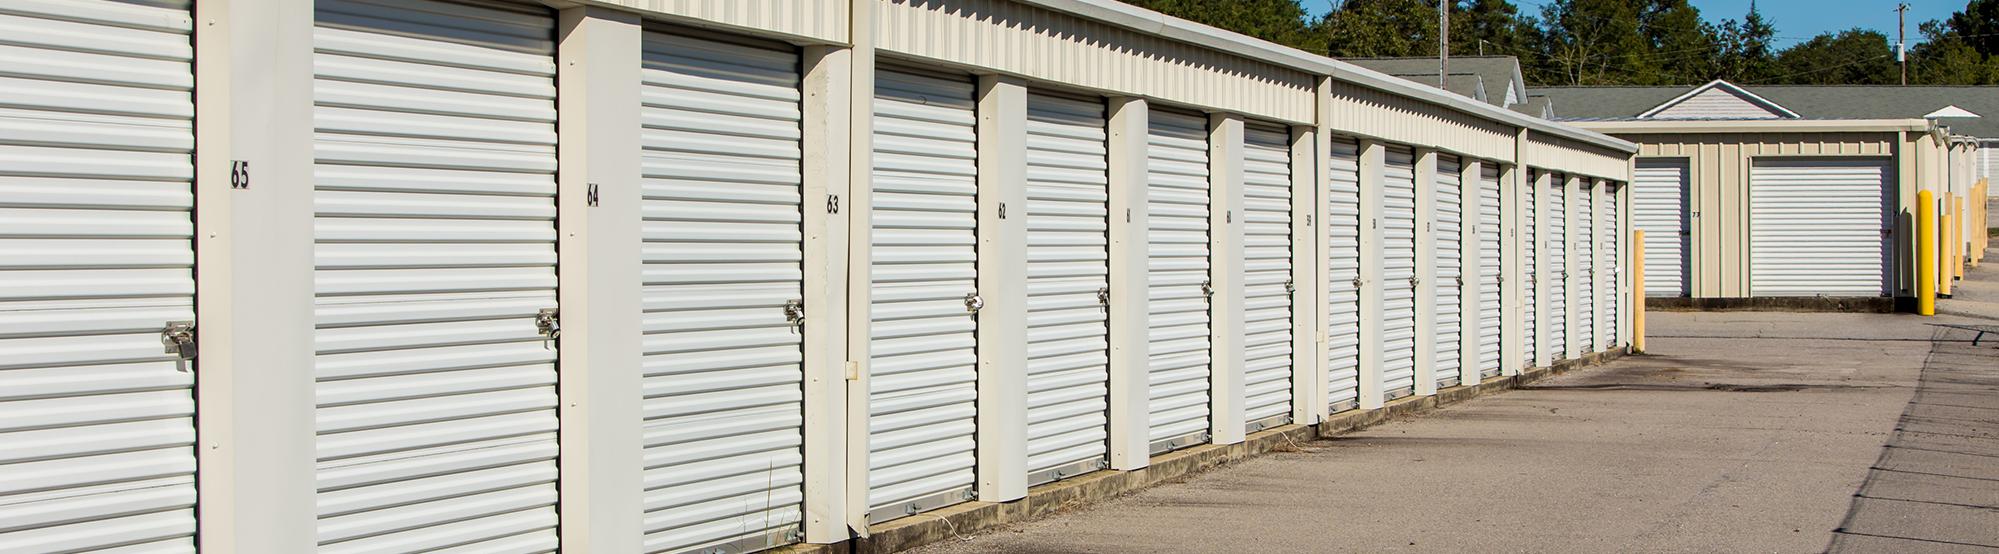 Drive Up Access Self Storage on Stewart St